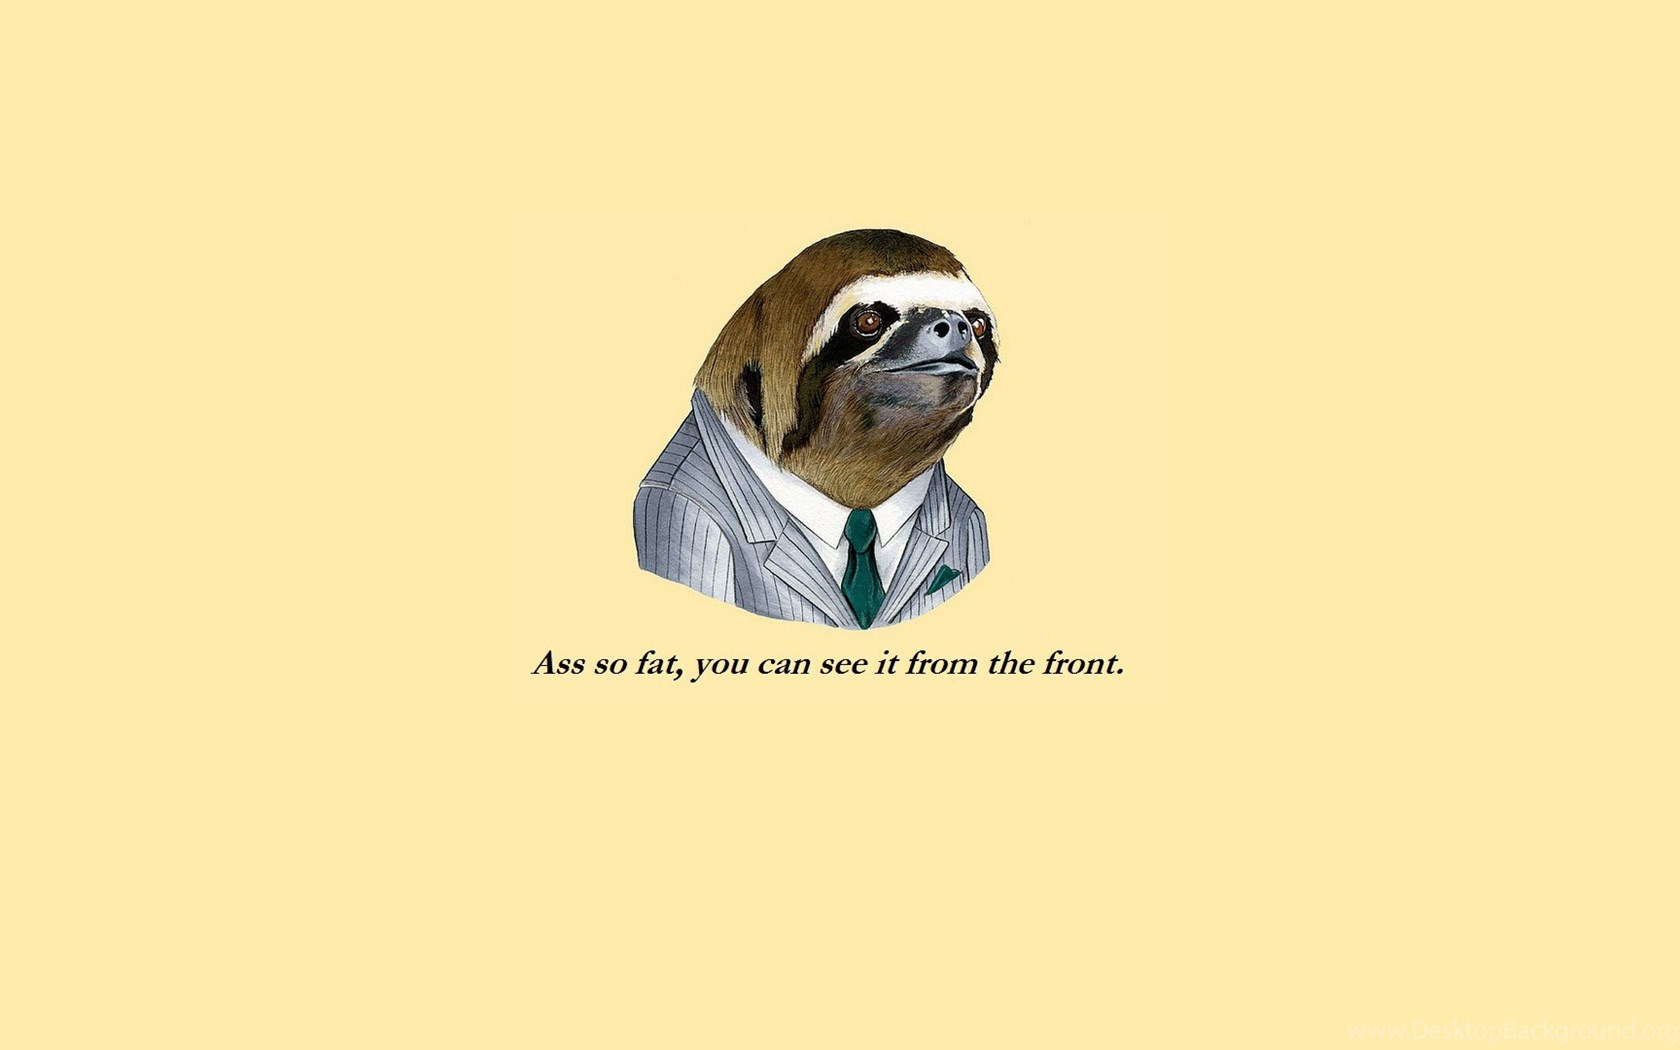 Funny Meme Phone Wallpapers : Funny sloth face meme hd wallpapers desktop background